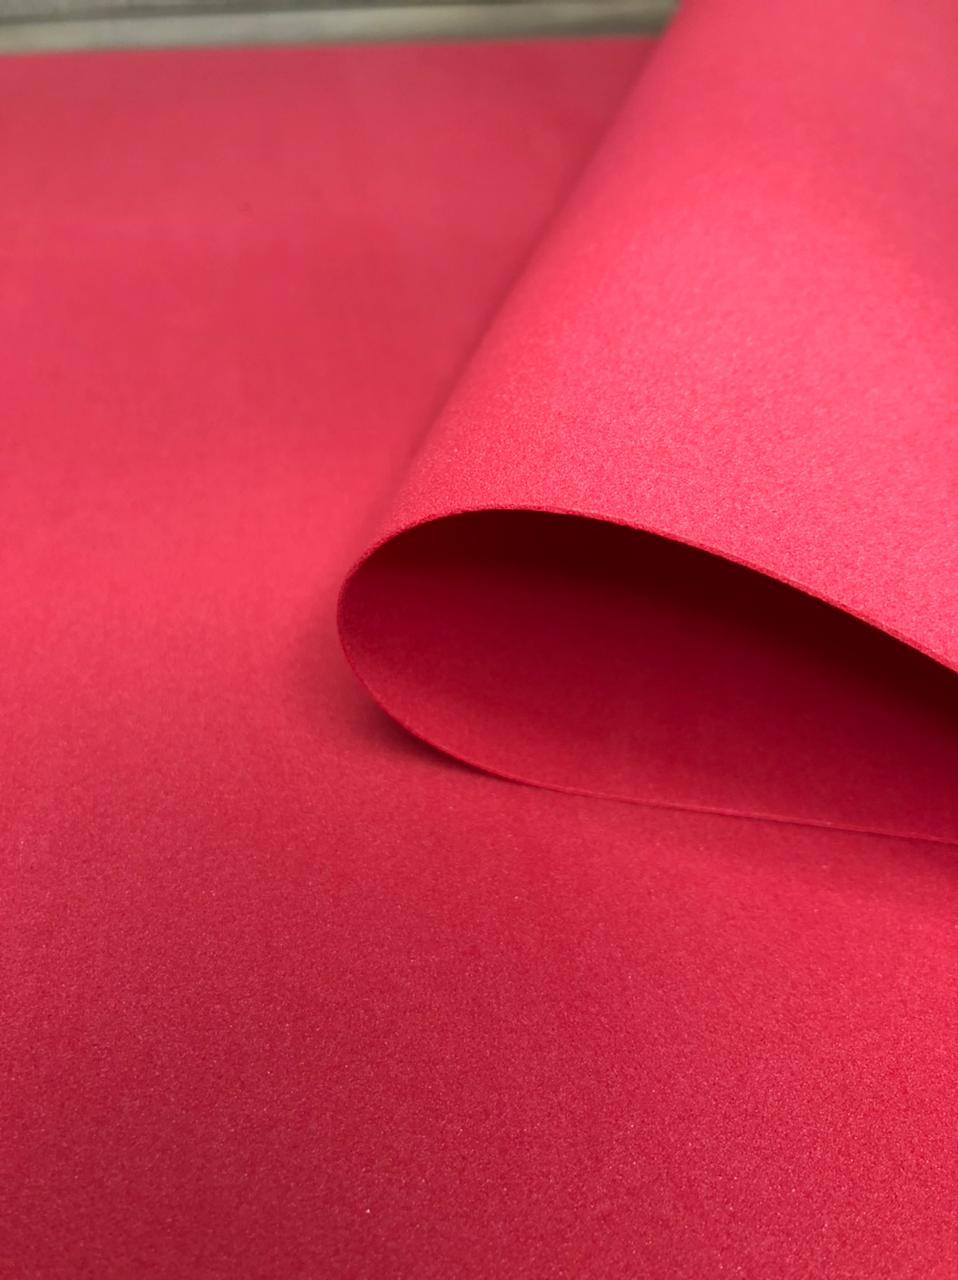 Фоамиран 1мм, красный, № 01 (50х50см)(Китай)